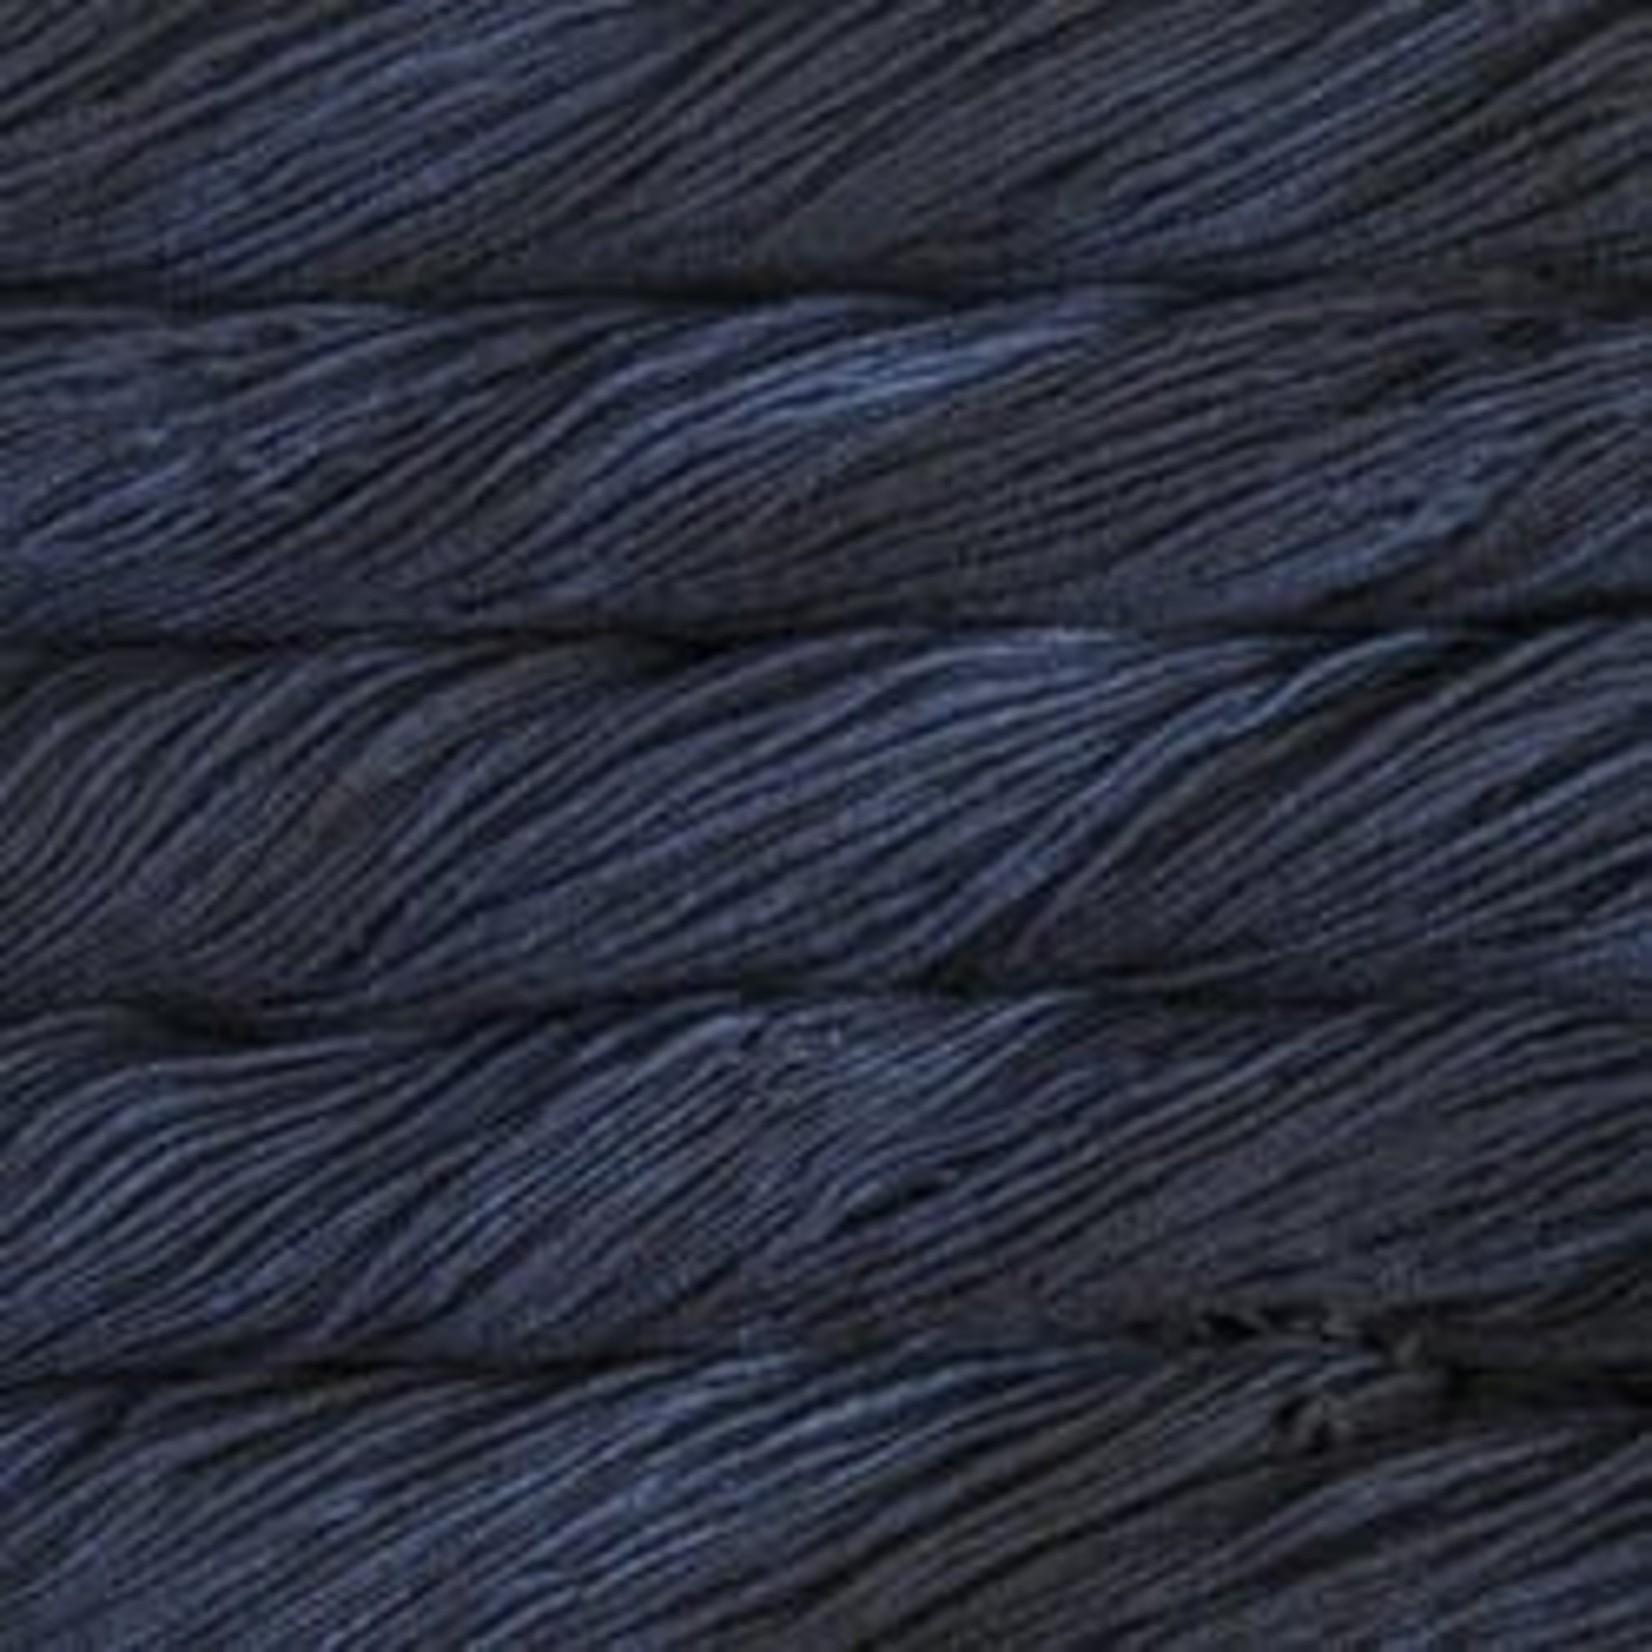 Malabrigo Arroyo, AR046, Prussia Blue